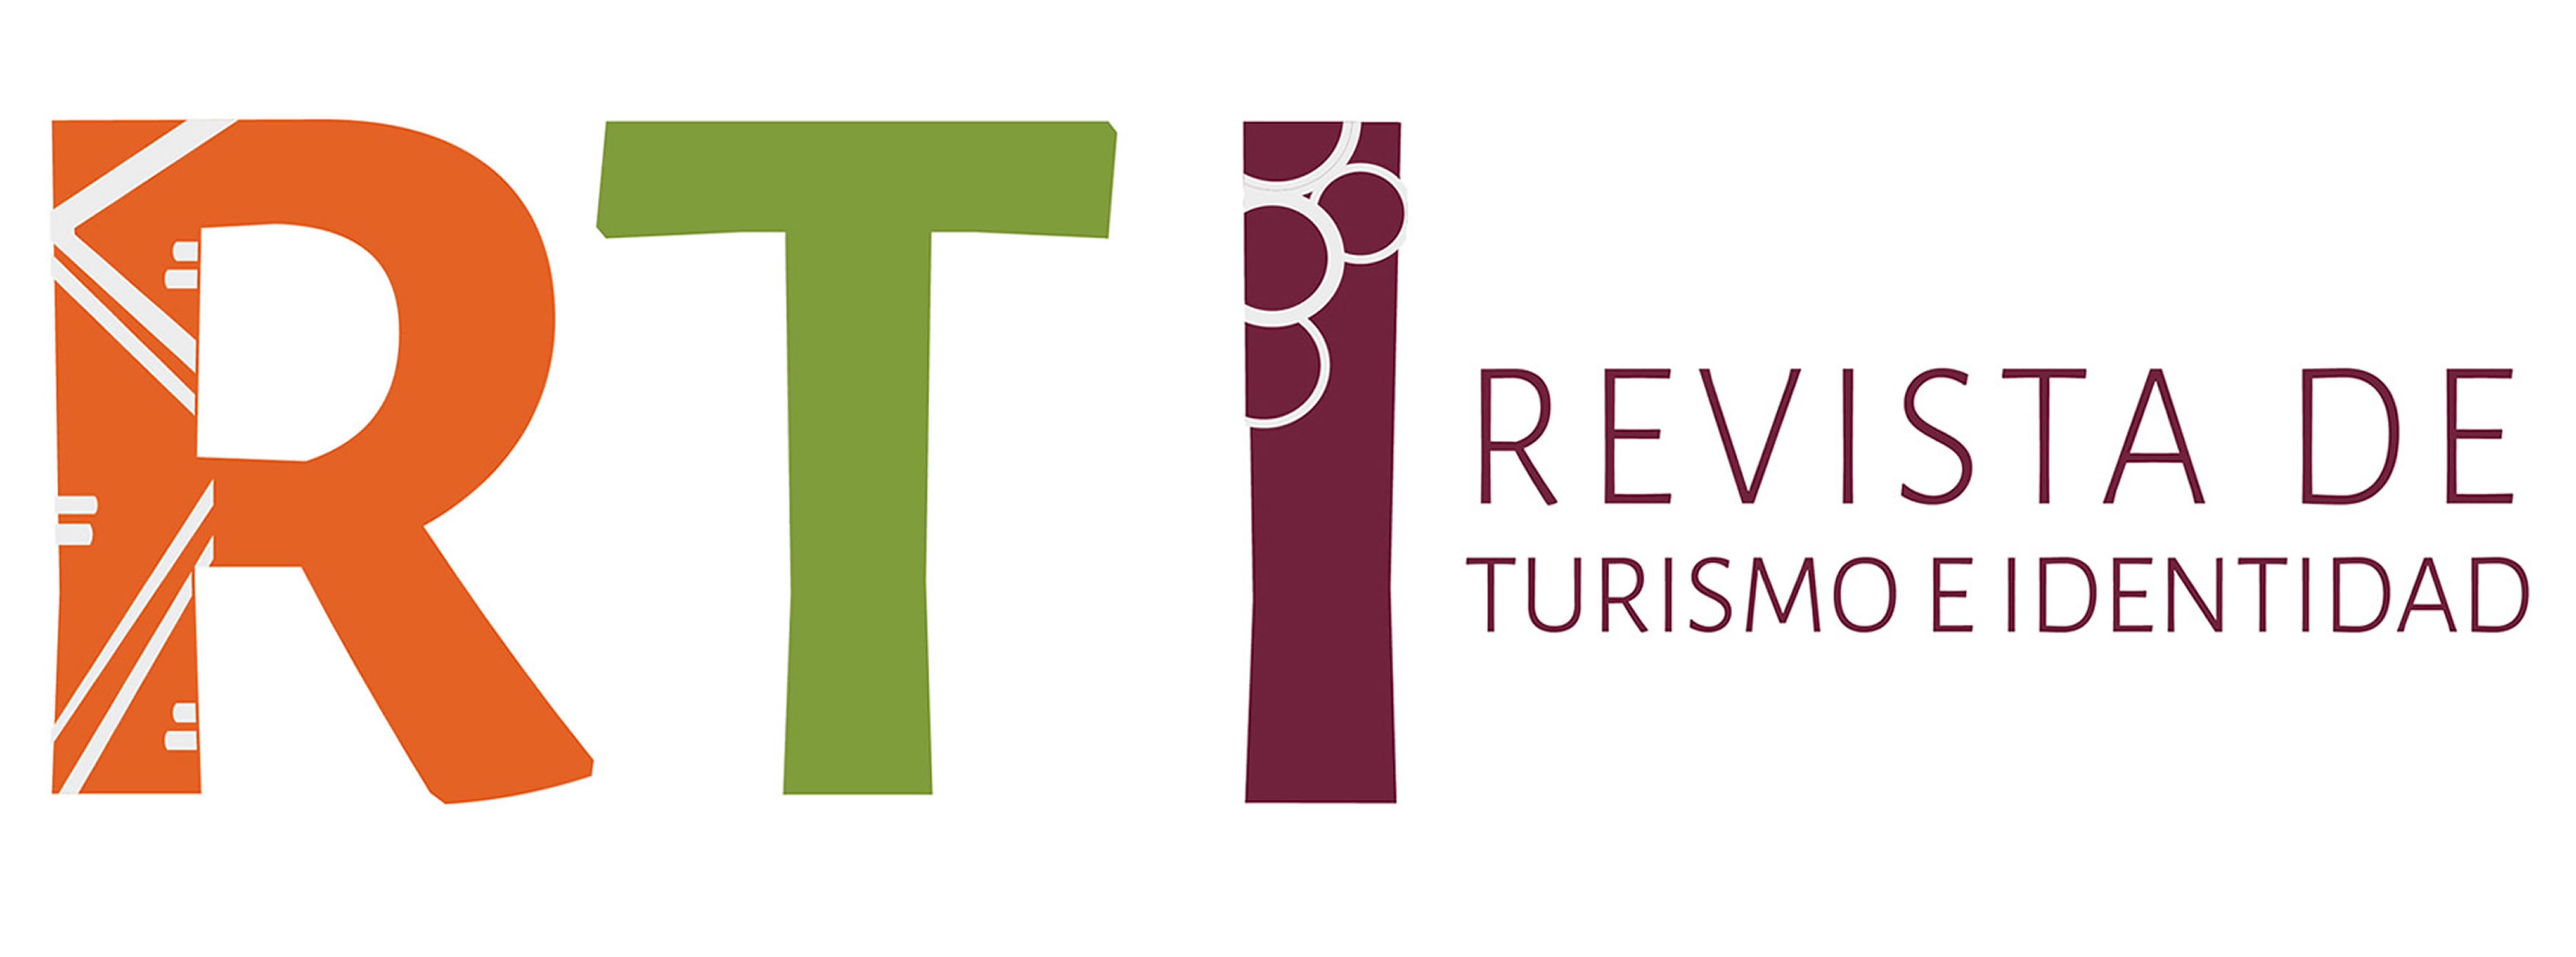 Revista de Turismo e Identidad